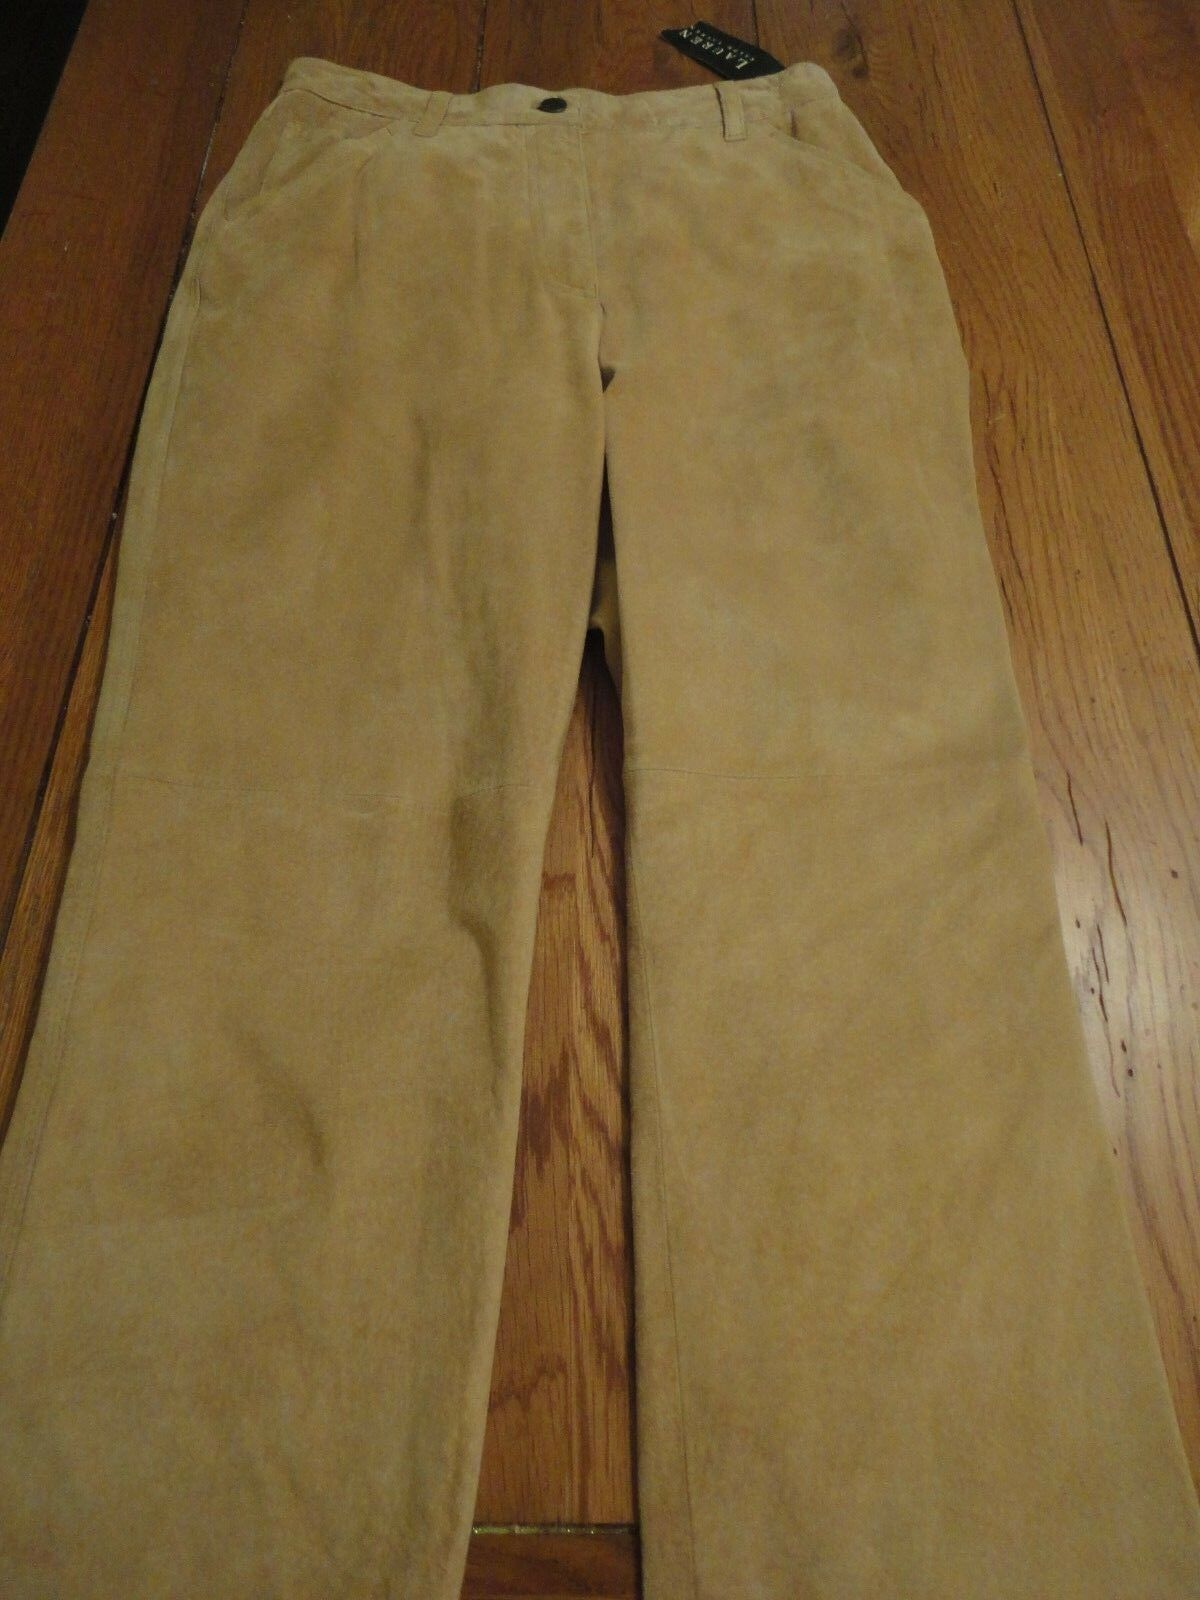 NEW LAUREN Ralph Lauren Suede leather lined pants size 6 NWT